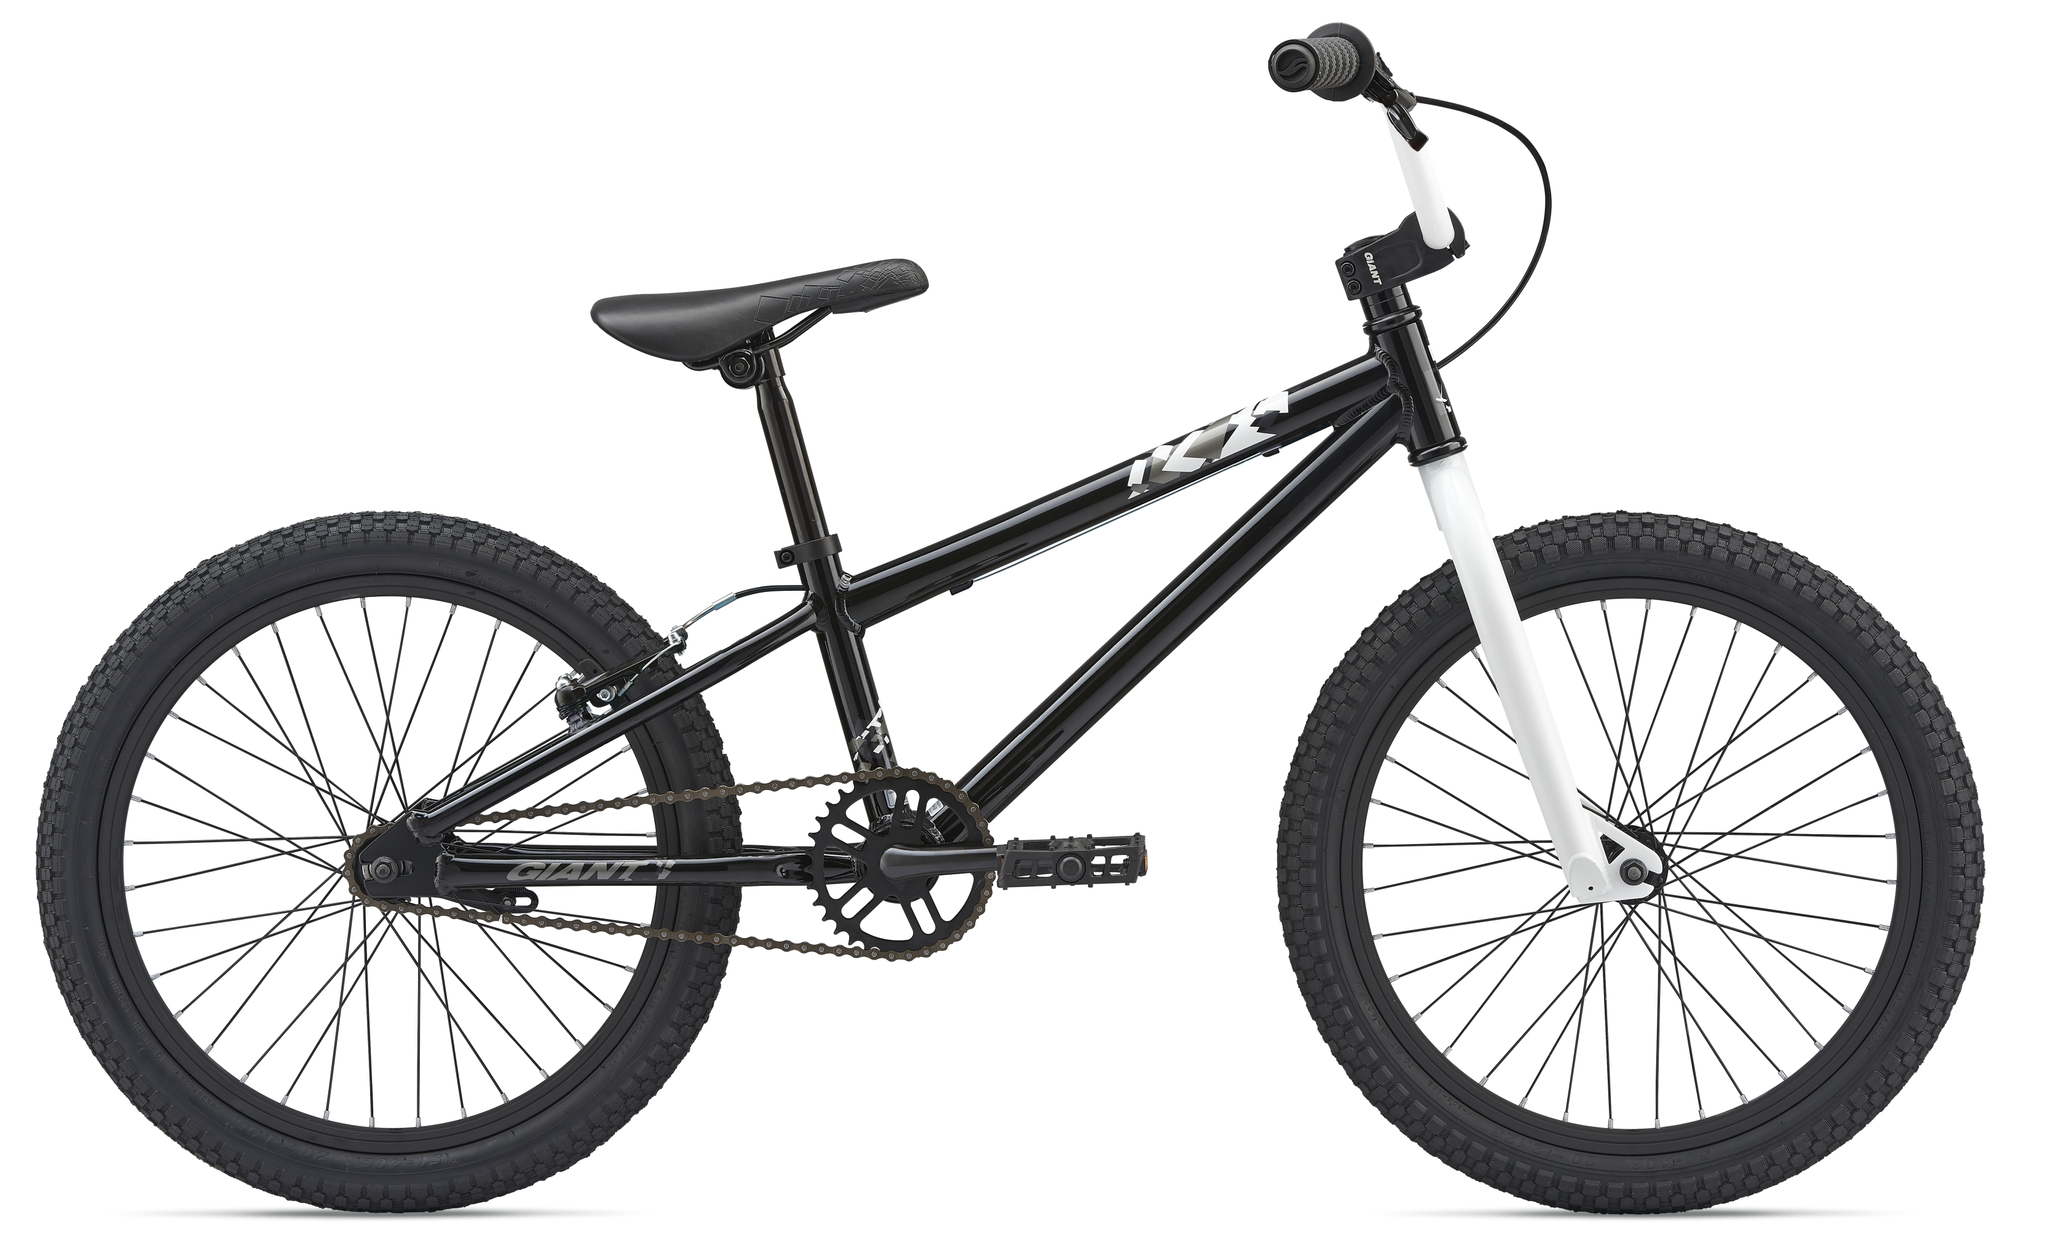 Giant Gfr C B Bicycle Playground Huntington Ny